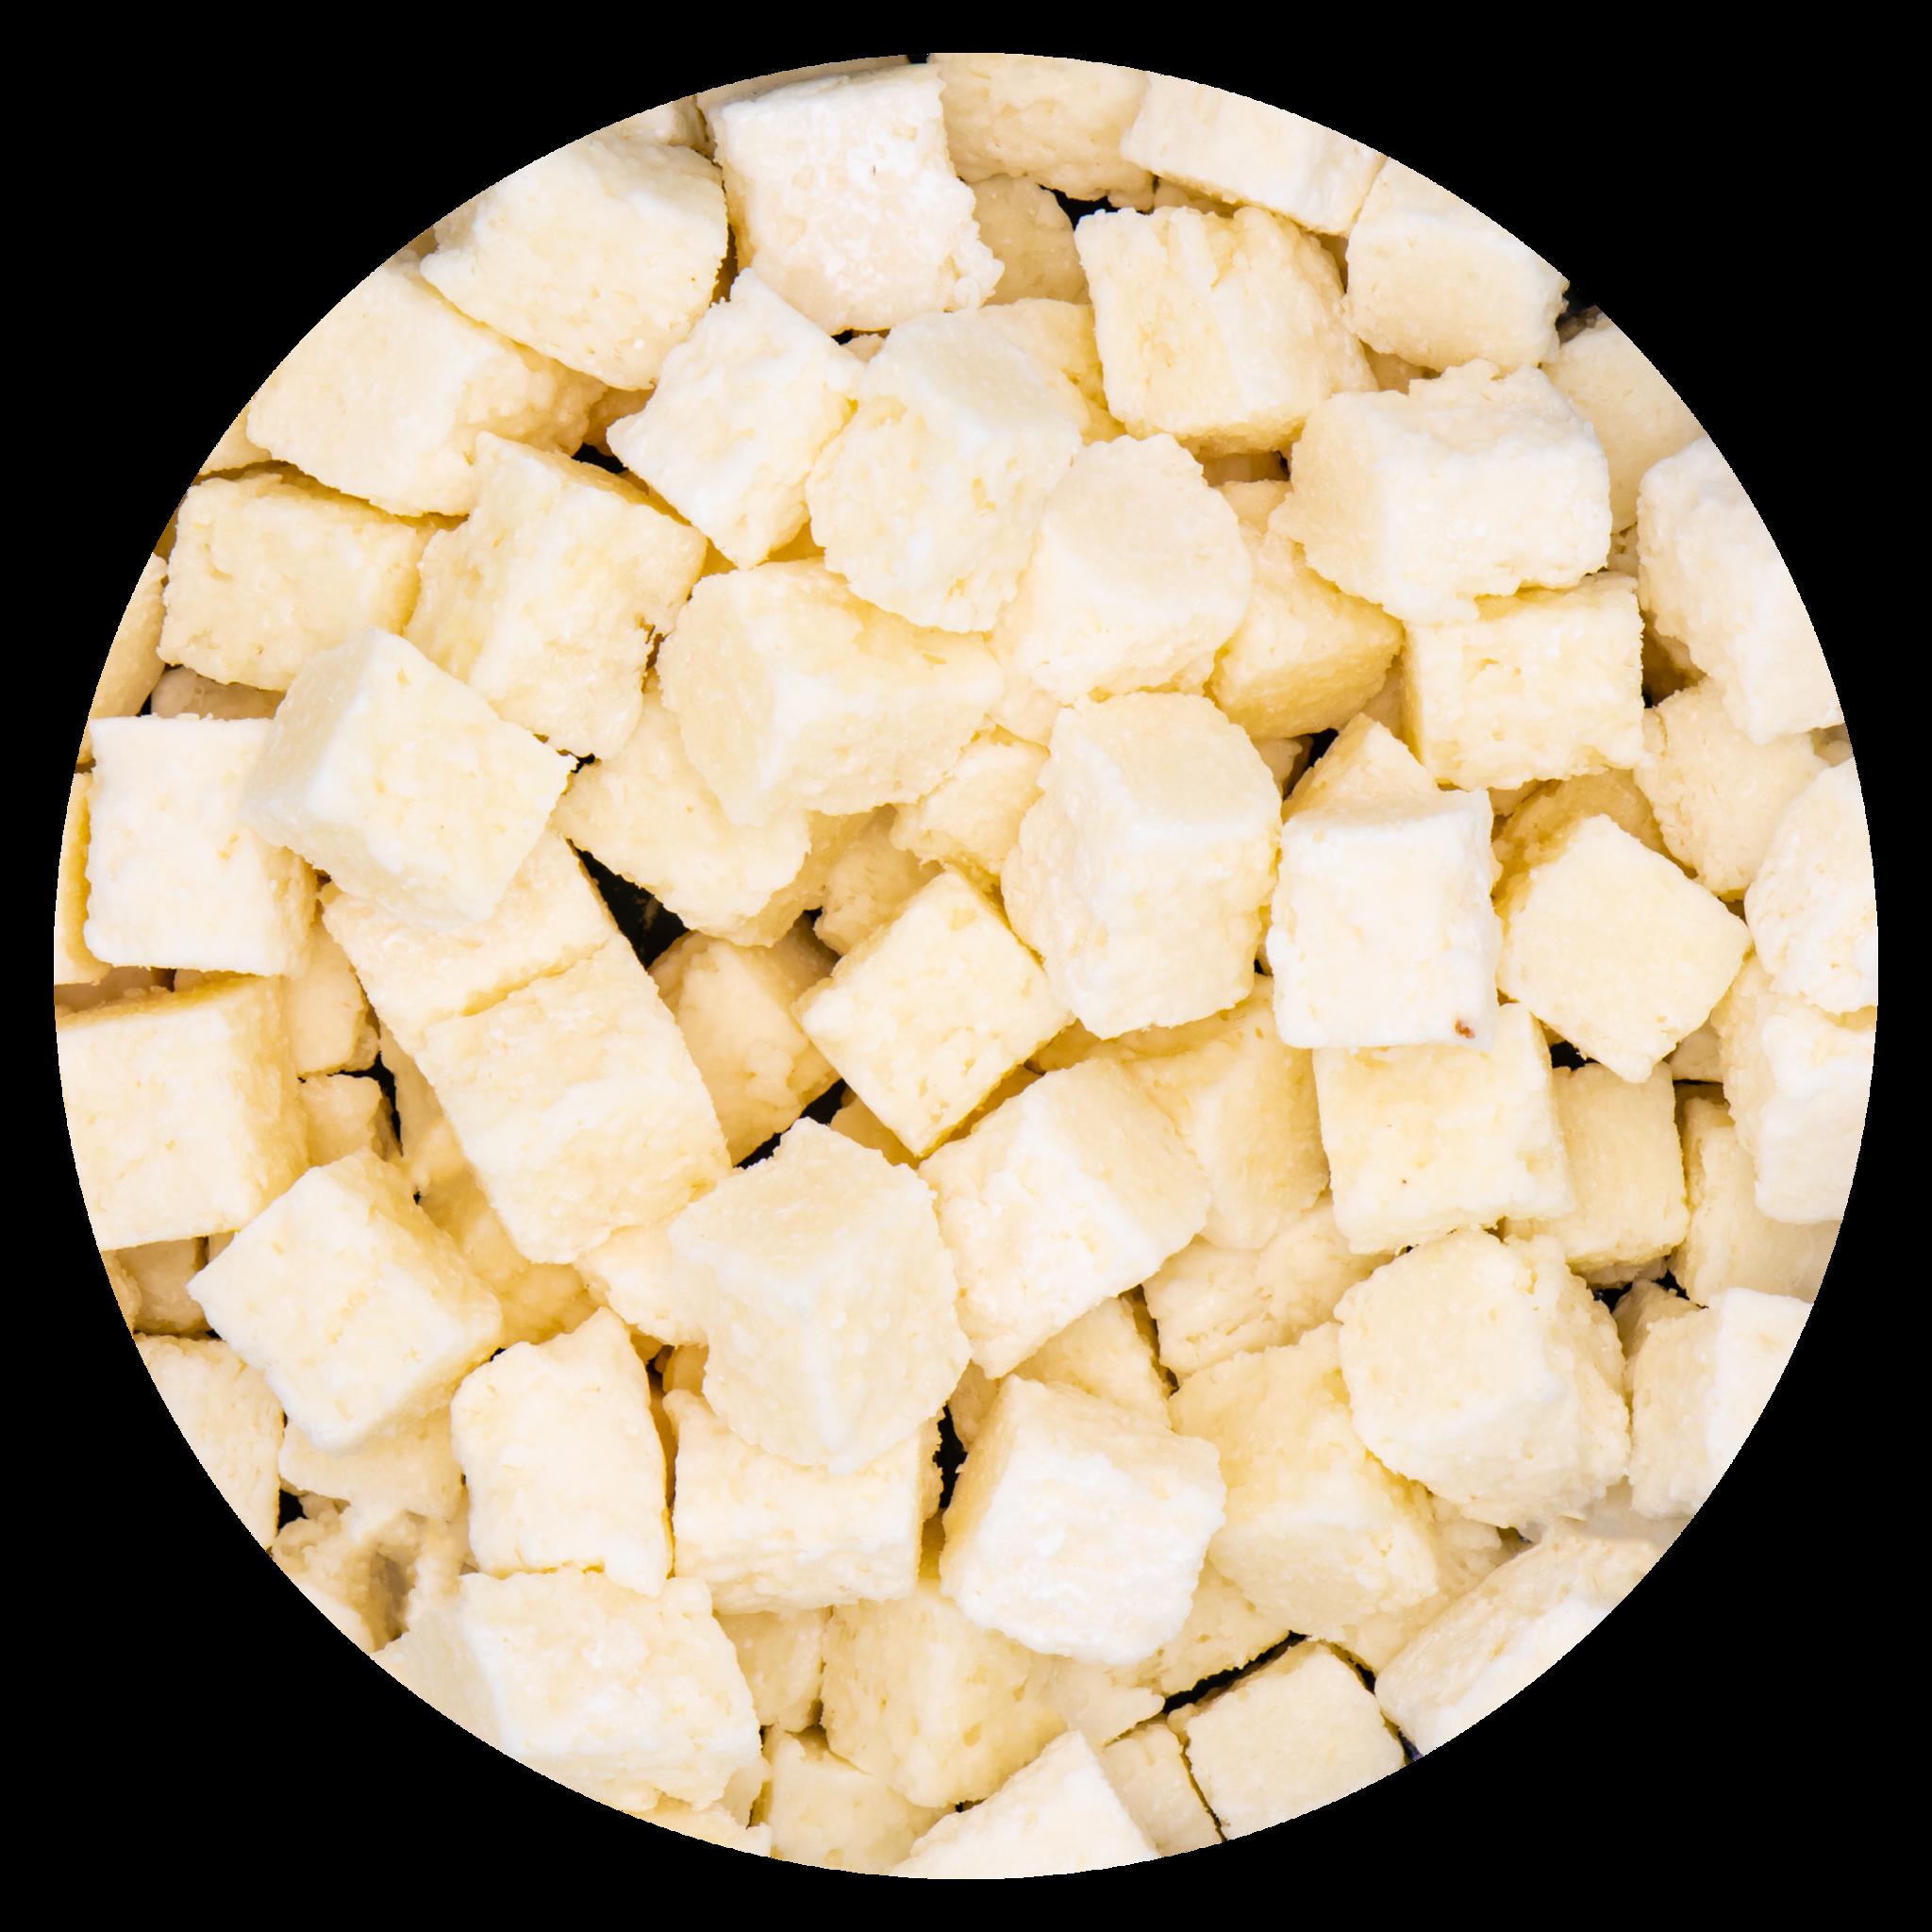 VDC Kokosstücke